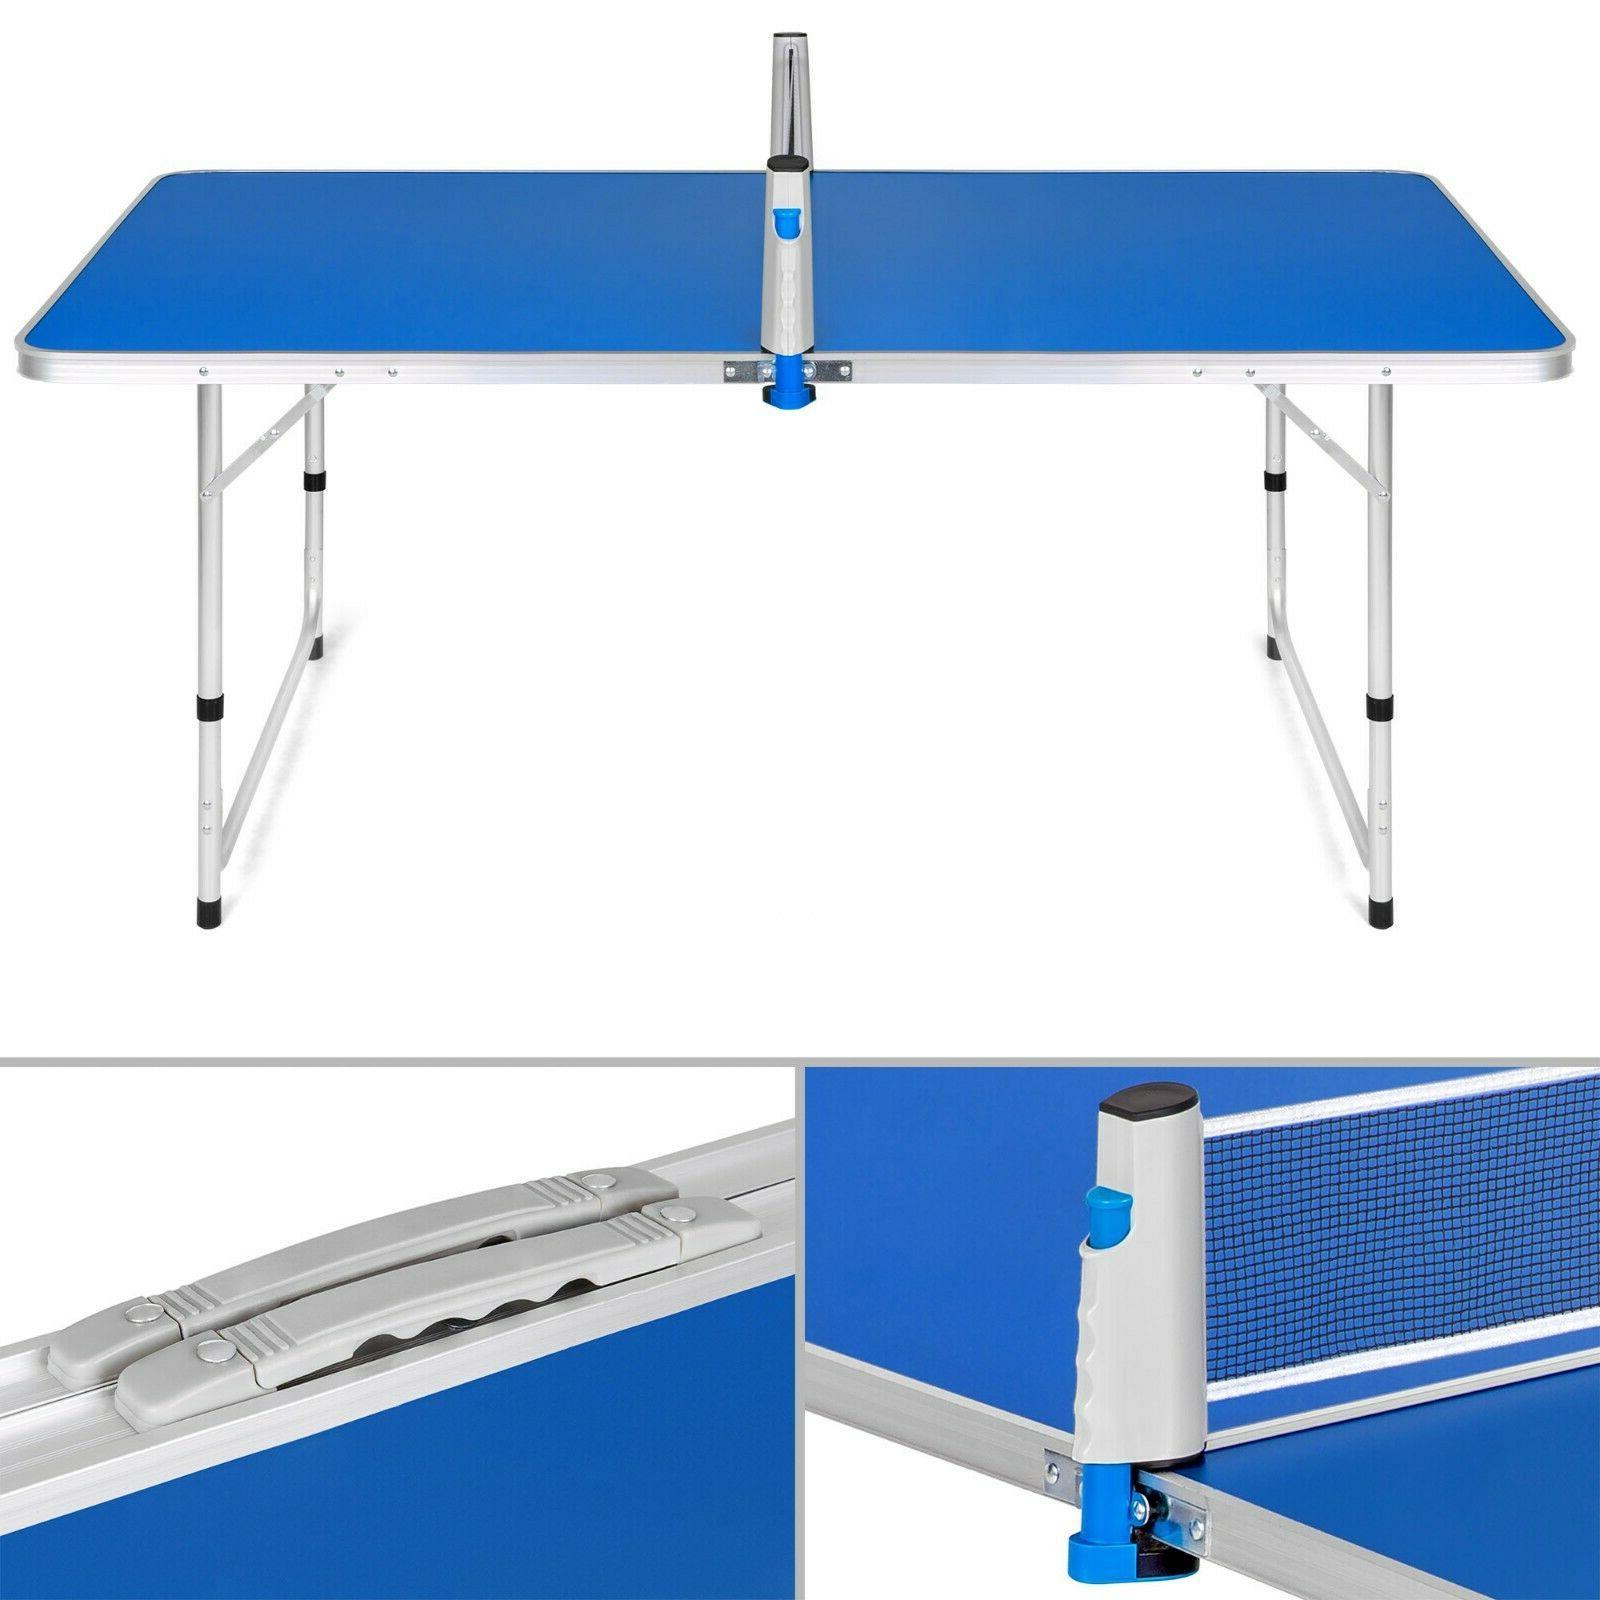 Portable Ping Pong Table Tennis Folding Camping Picnic Game